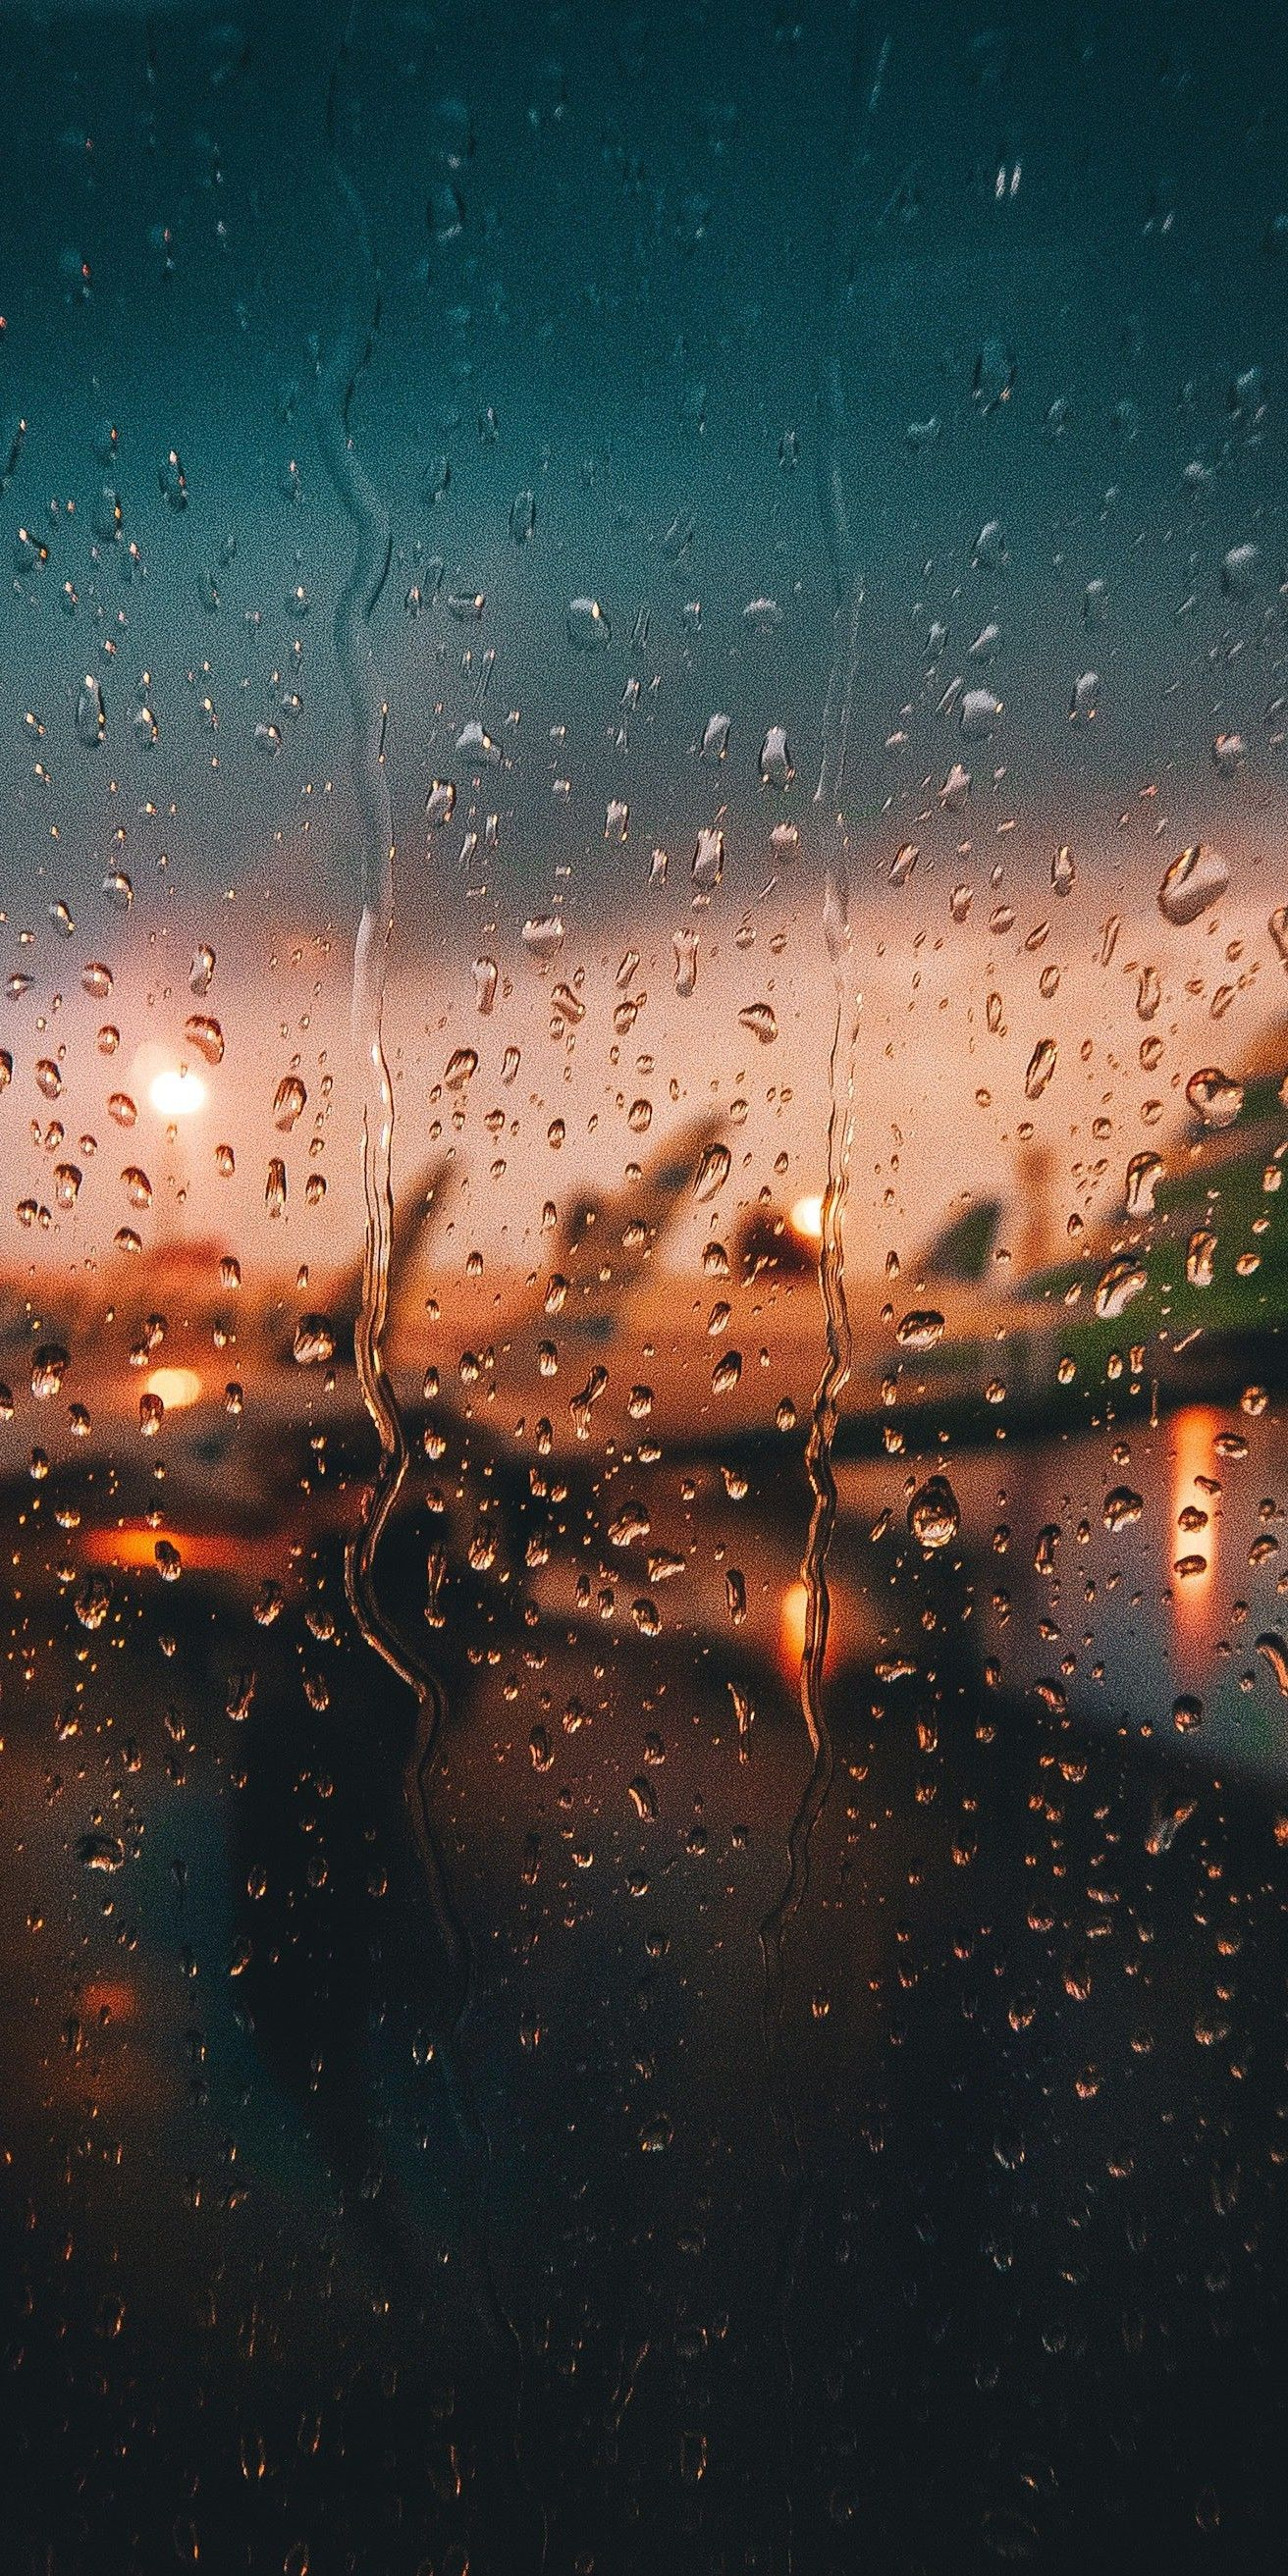 Pin by Iyan Sofyan on Rain Sunset iphone wallpaper Rainy 1312x2625